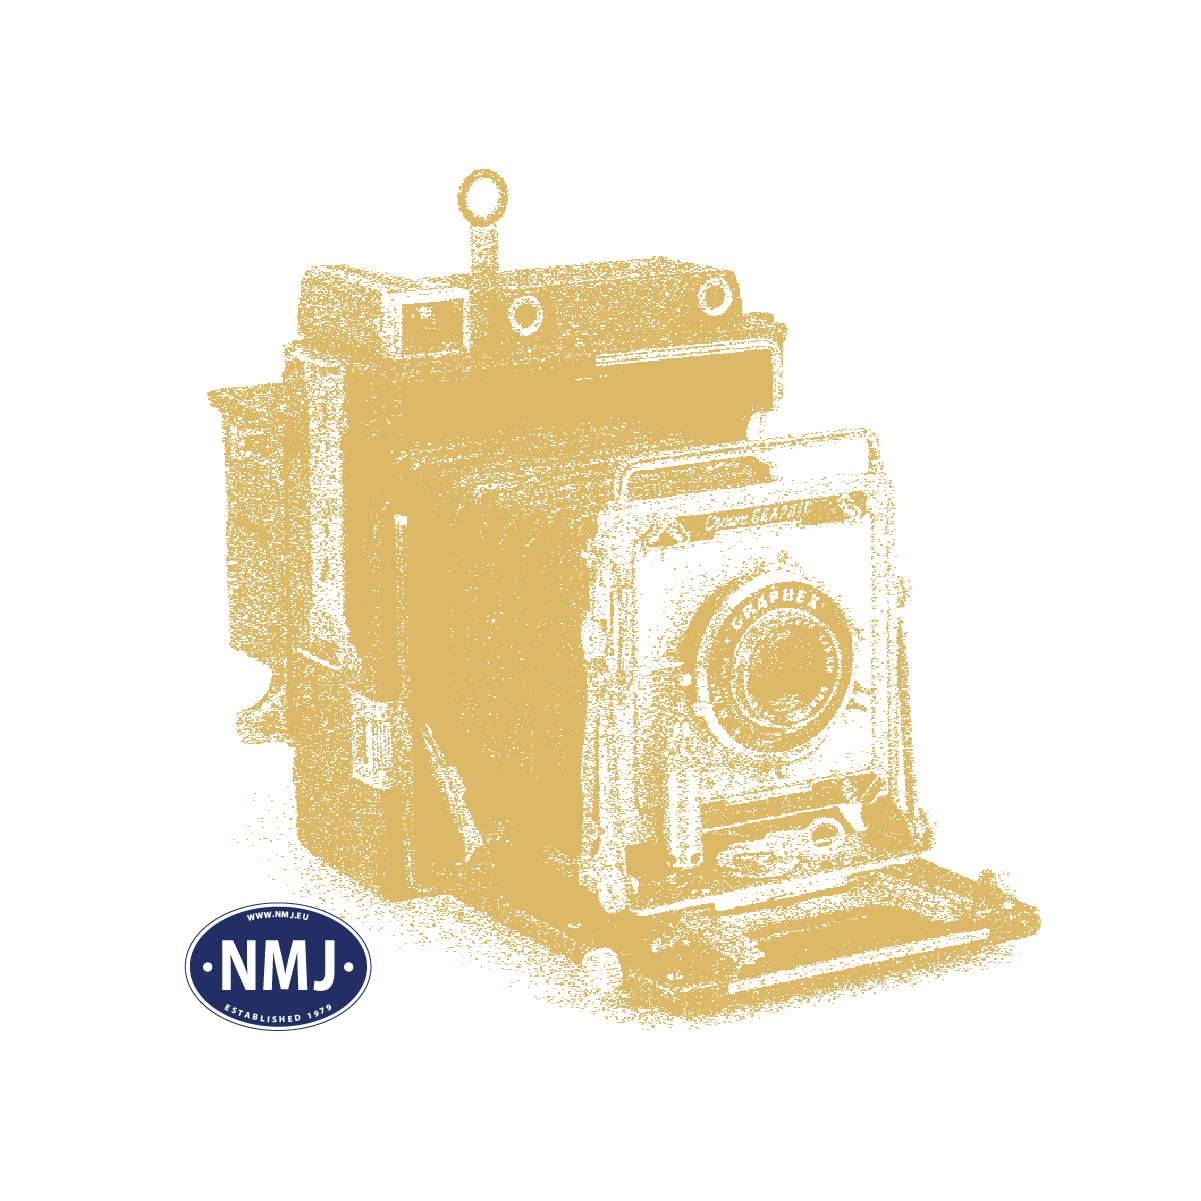 NMJT84.101AC - NMJ Topline NSB BM69A.01, AC digital